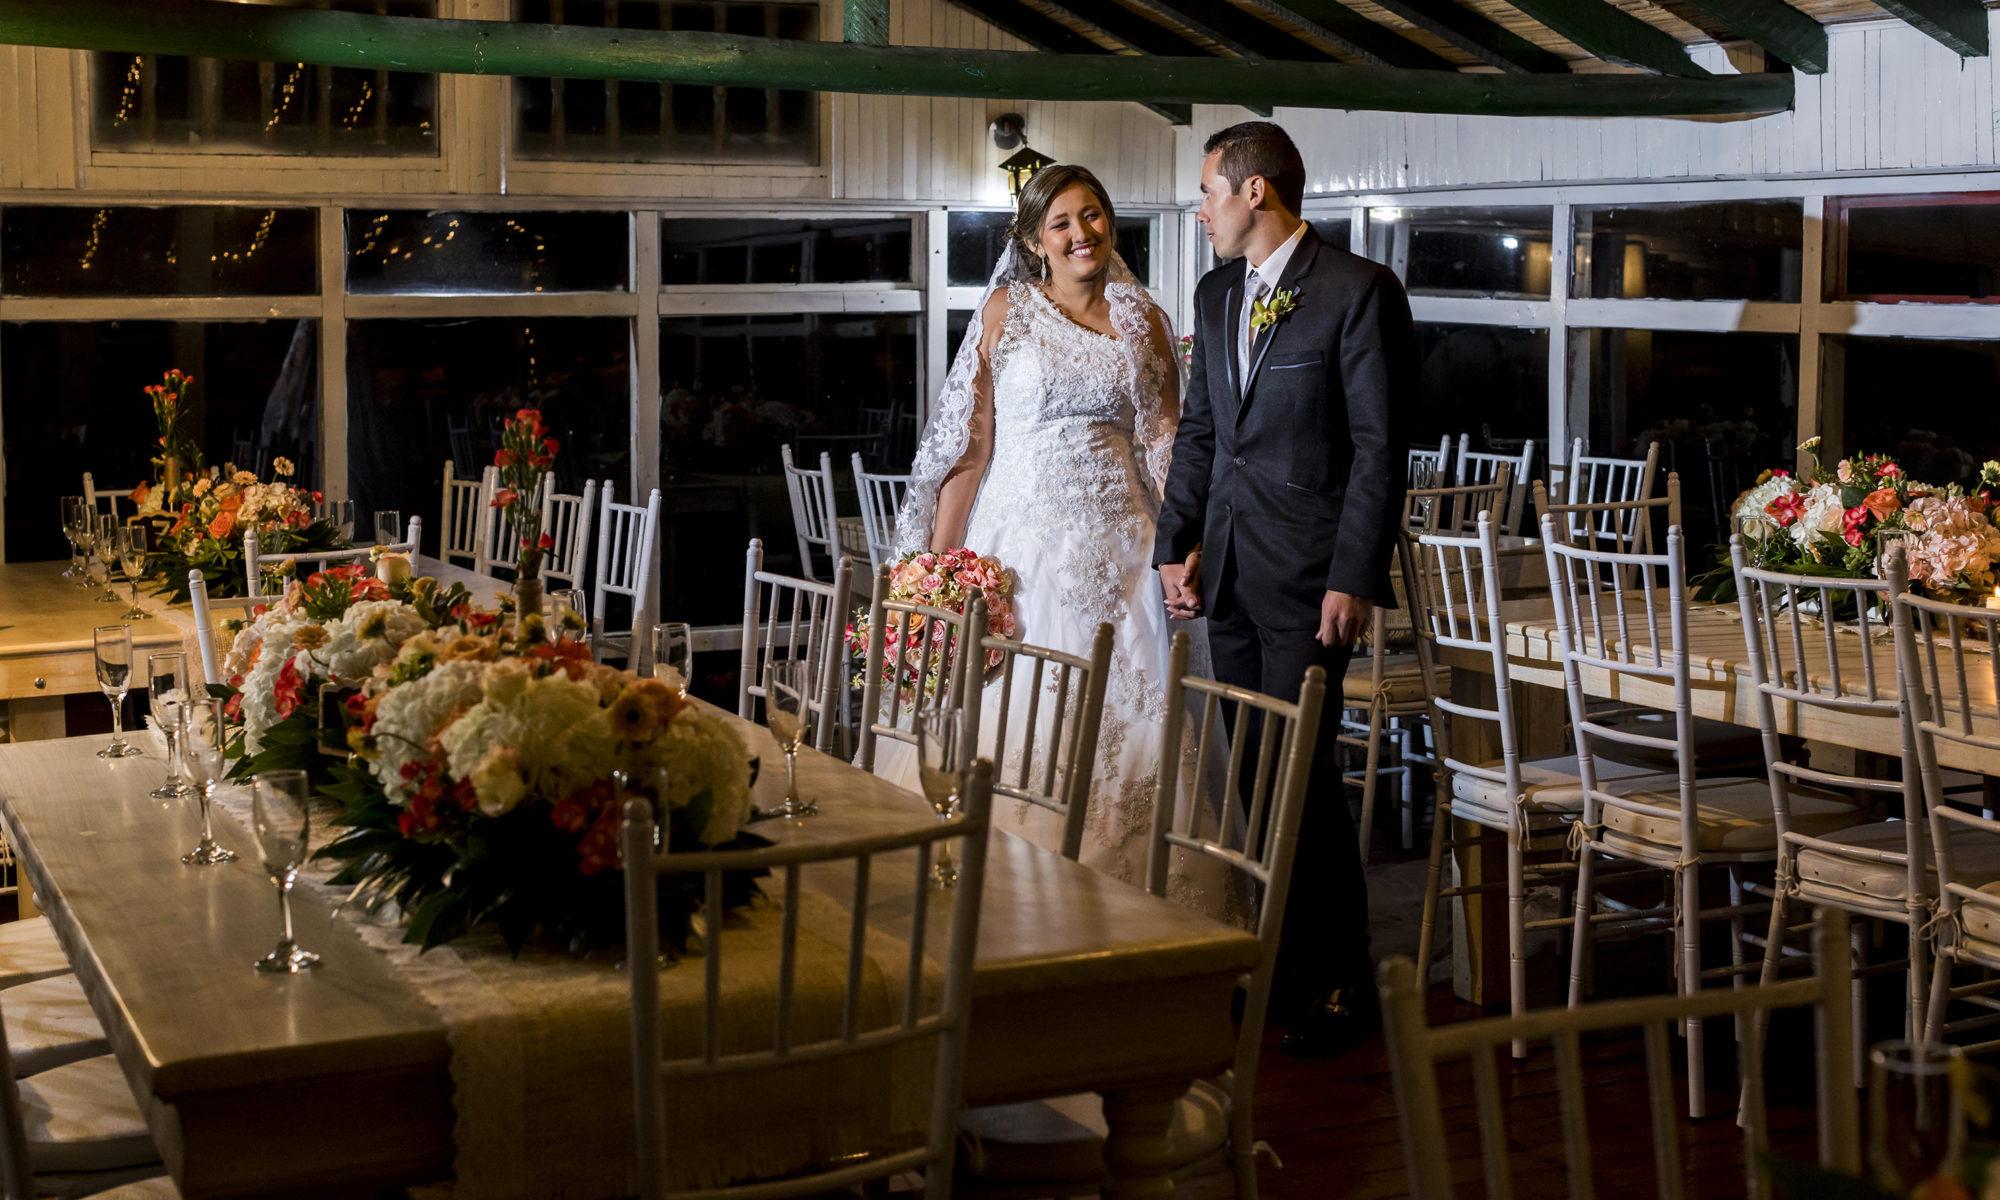 Valor Matrimonio Catolico Bogota : Matrimonio cristiano archives page of haciendas para